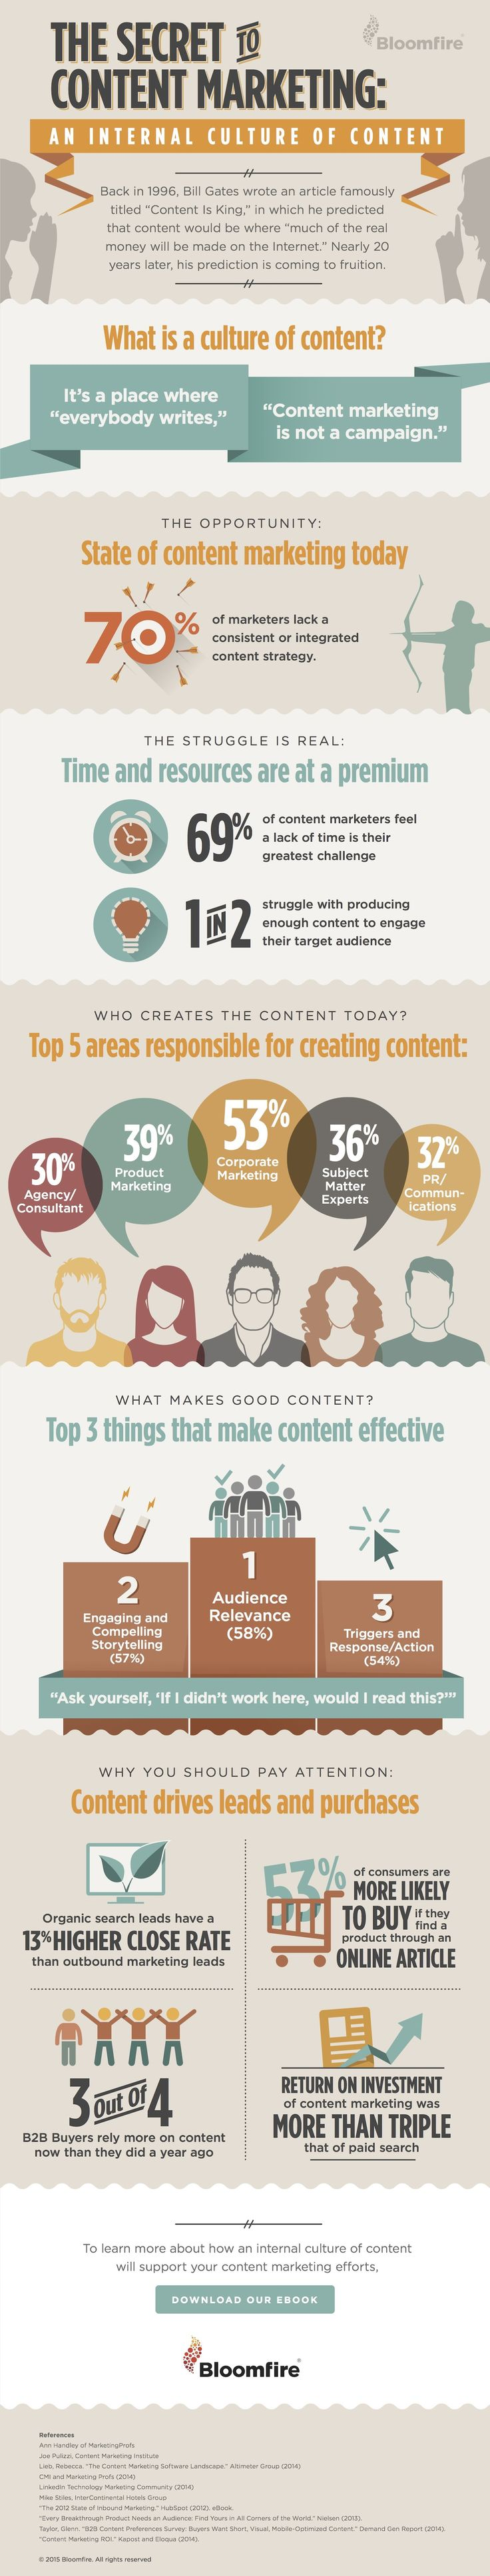 Content marketing secrets. #content #marketing #business #inbound